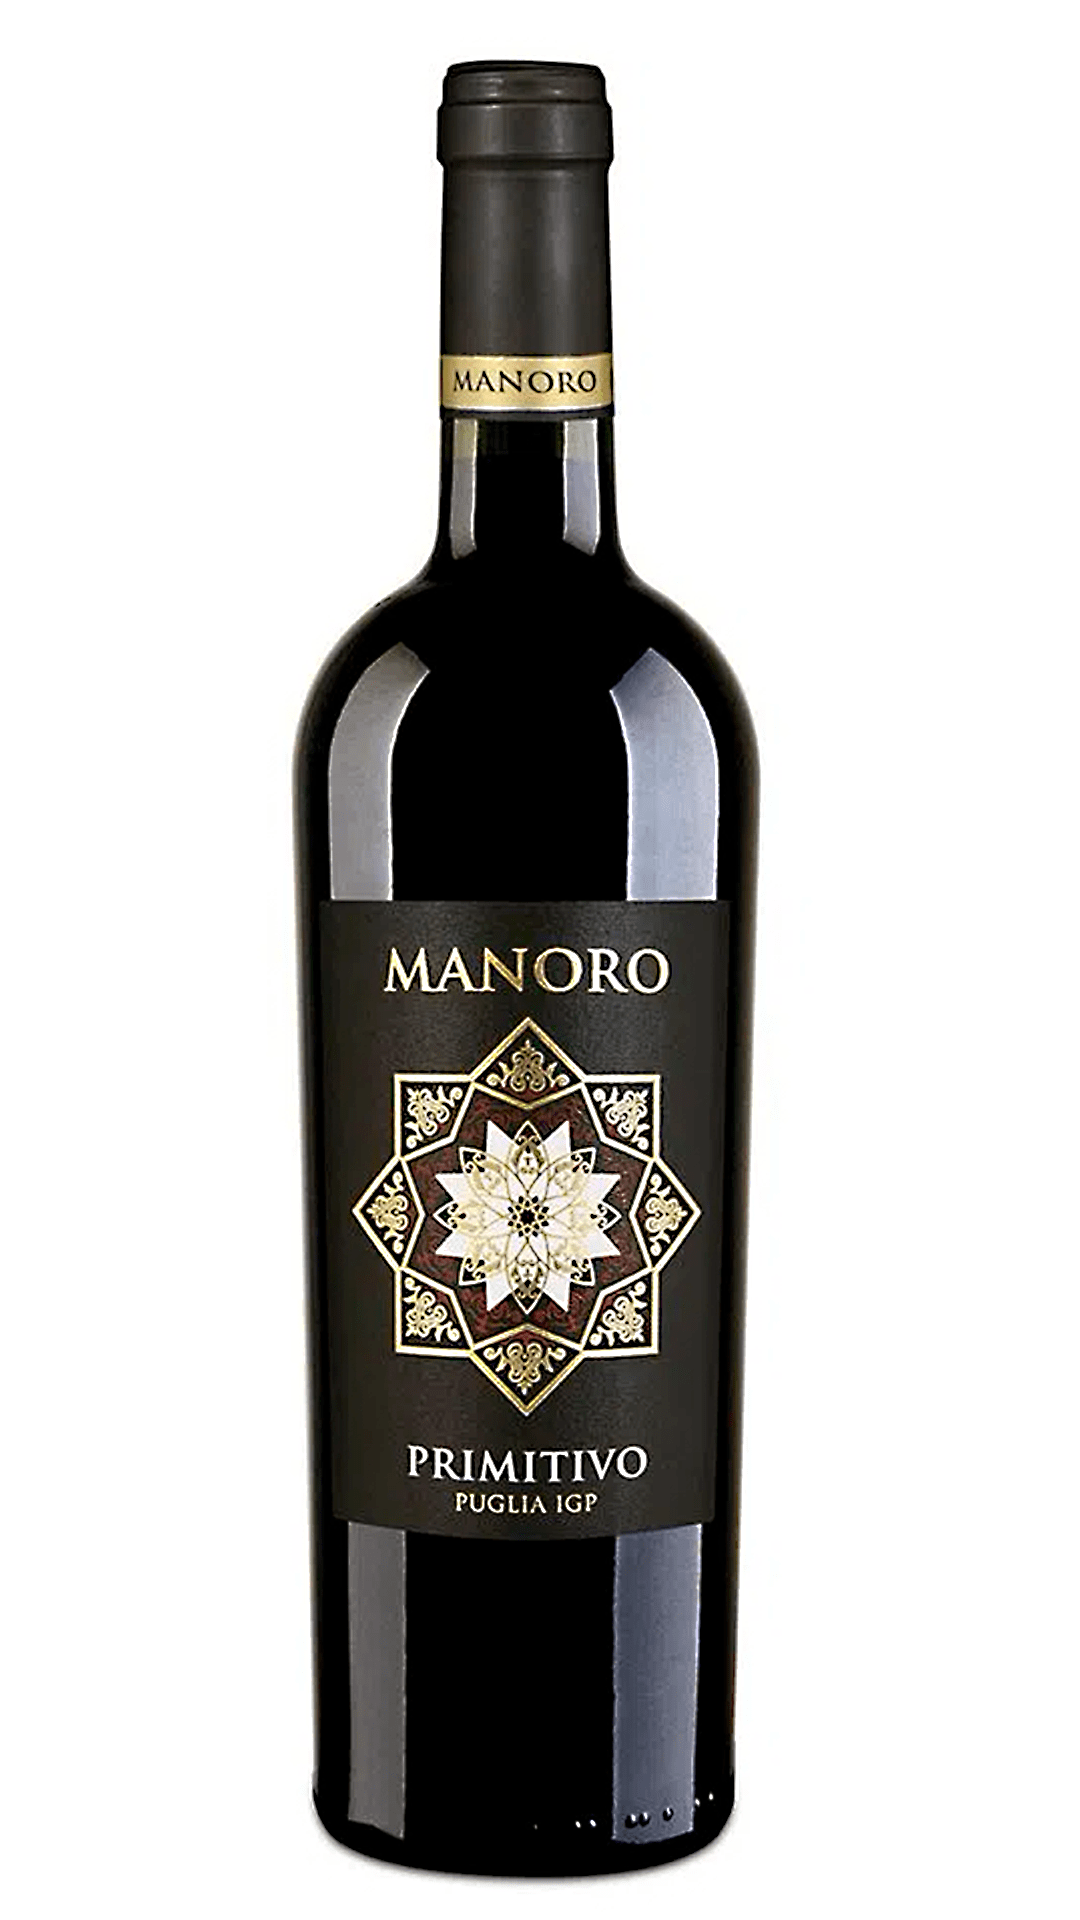 Manoro-Primitivo-Puglia-IGP